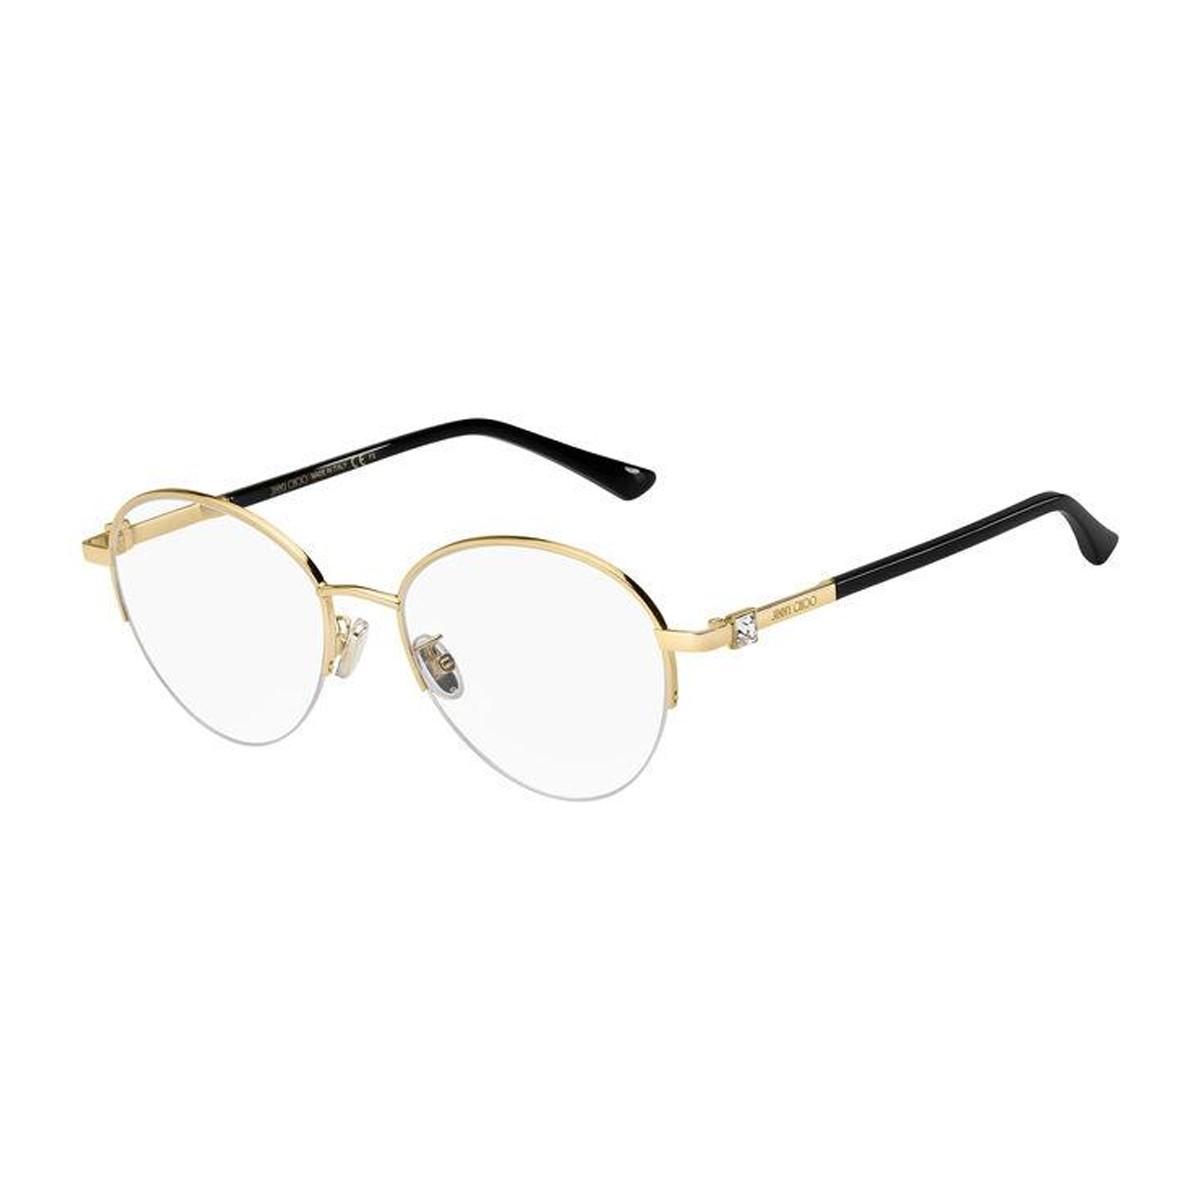 Jimmy Choo Jc290/f   Women's eyeglasses